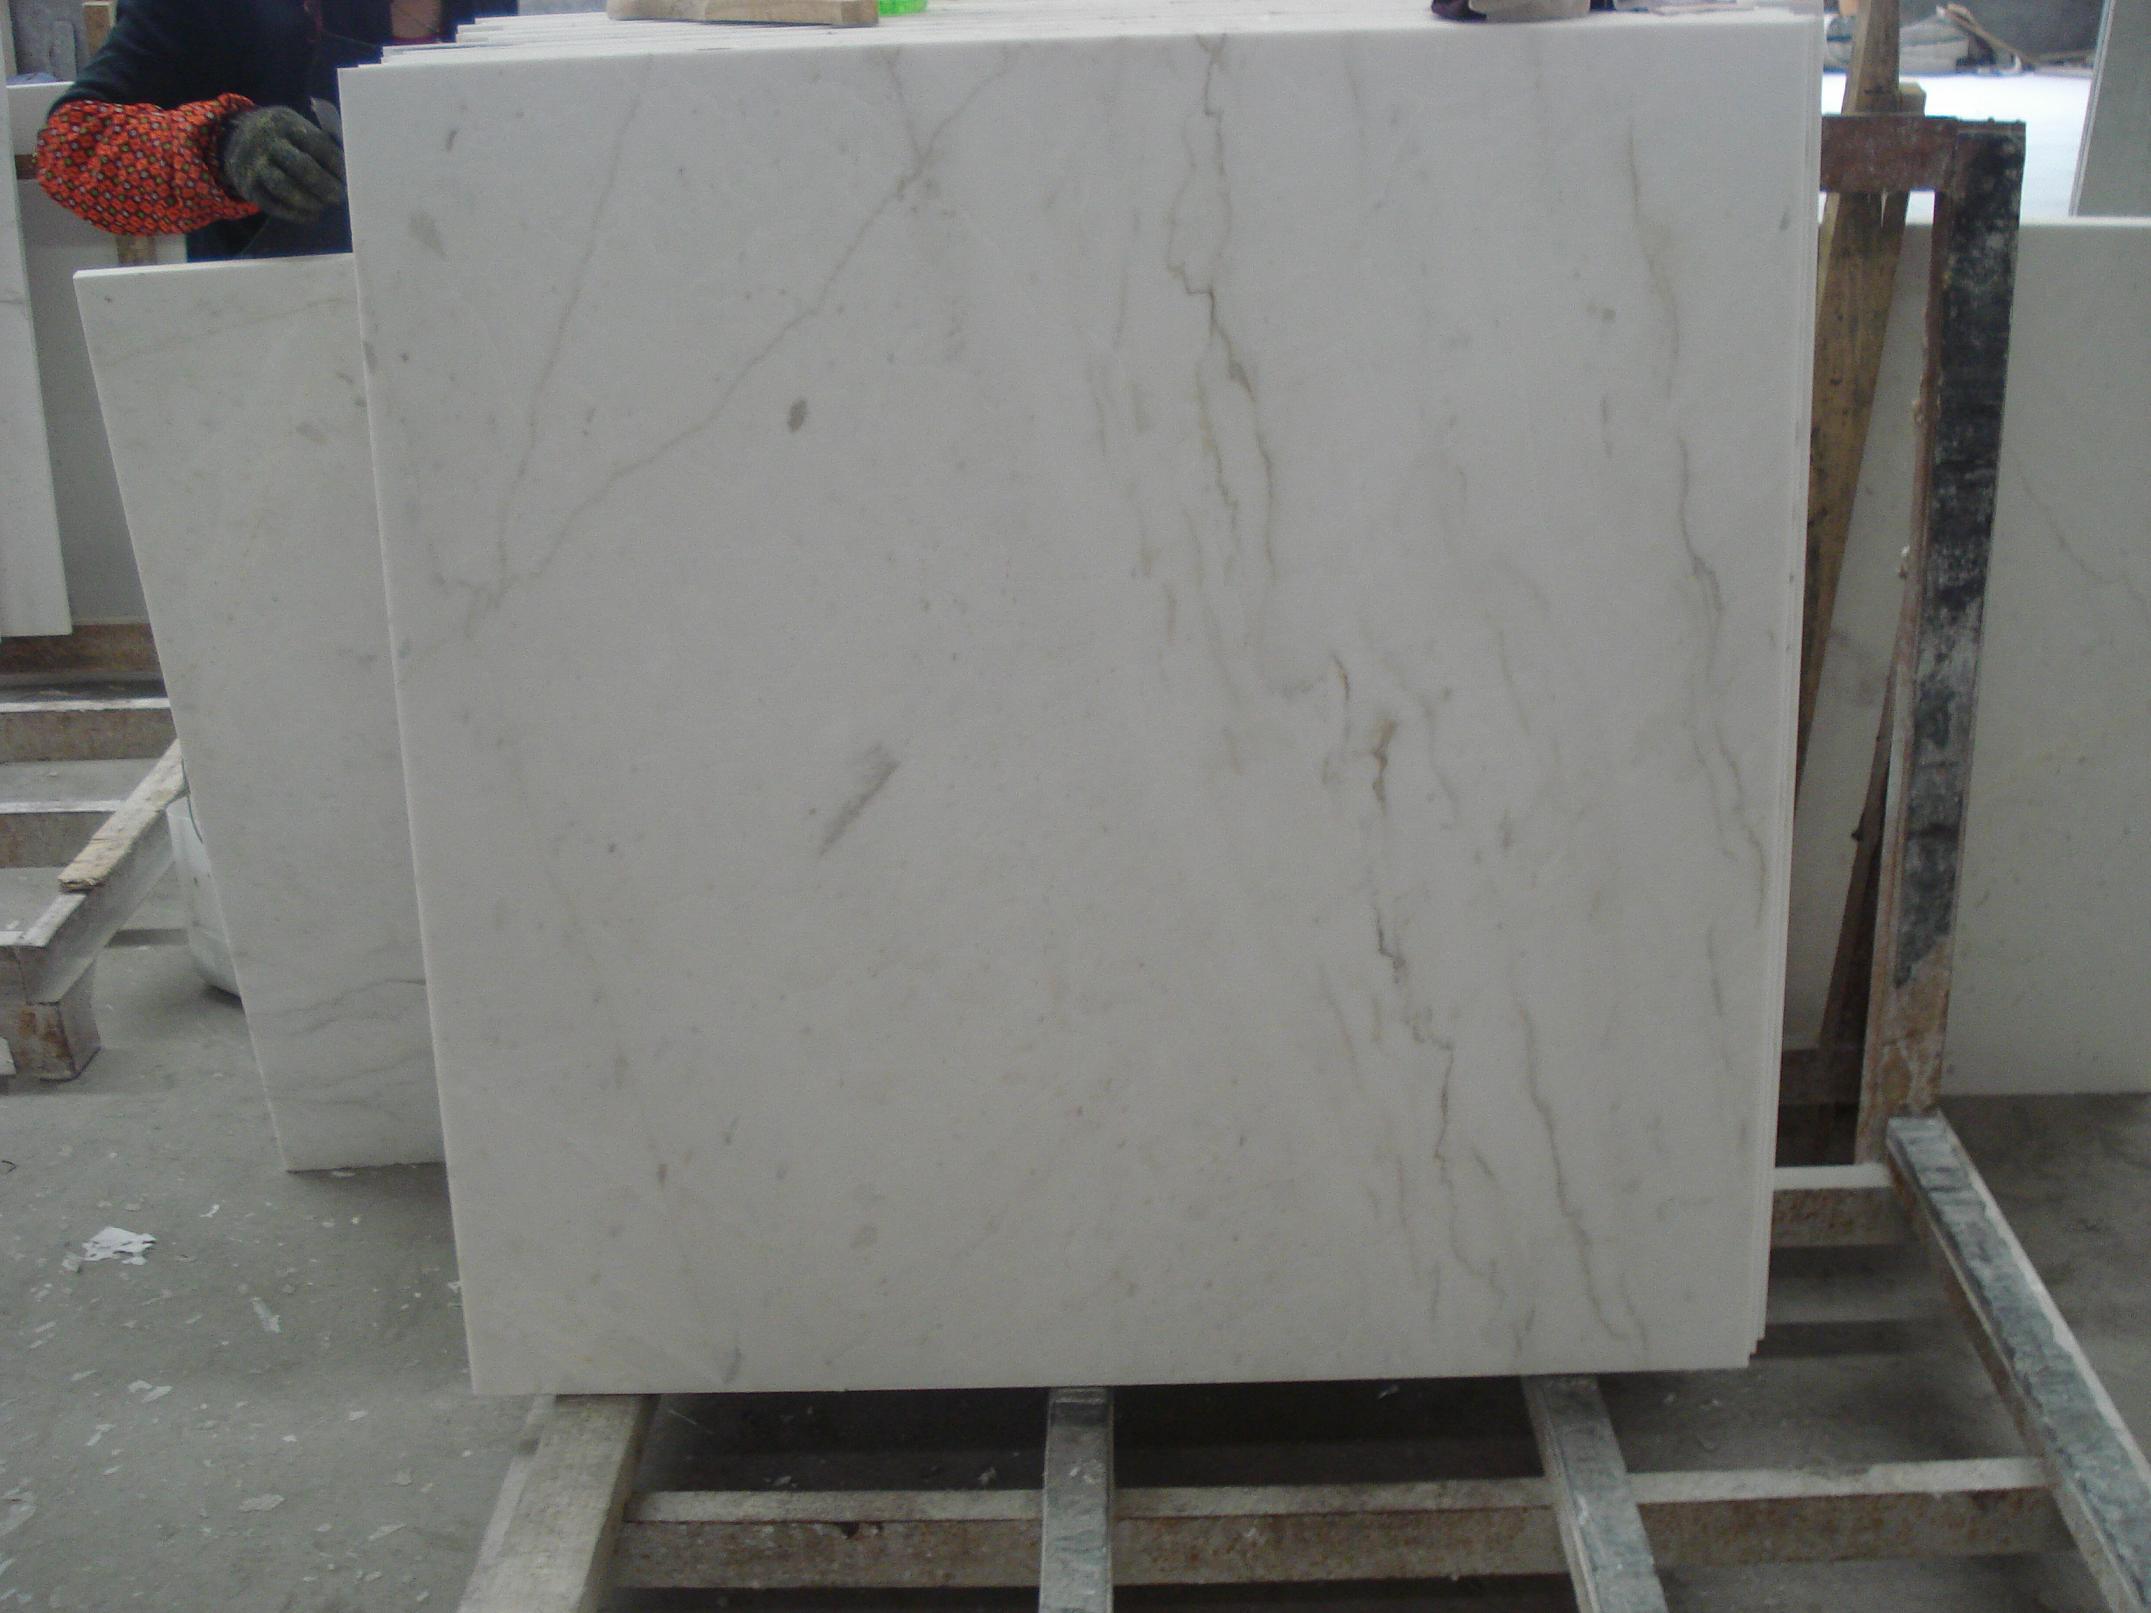 M rmol blanco griego de volakas azulejo de m rmol blanco for Significado de marmol